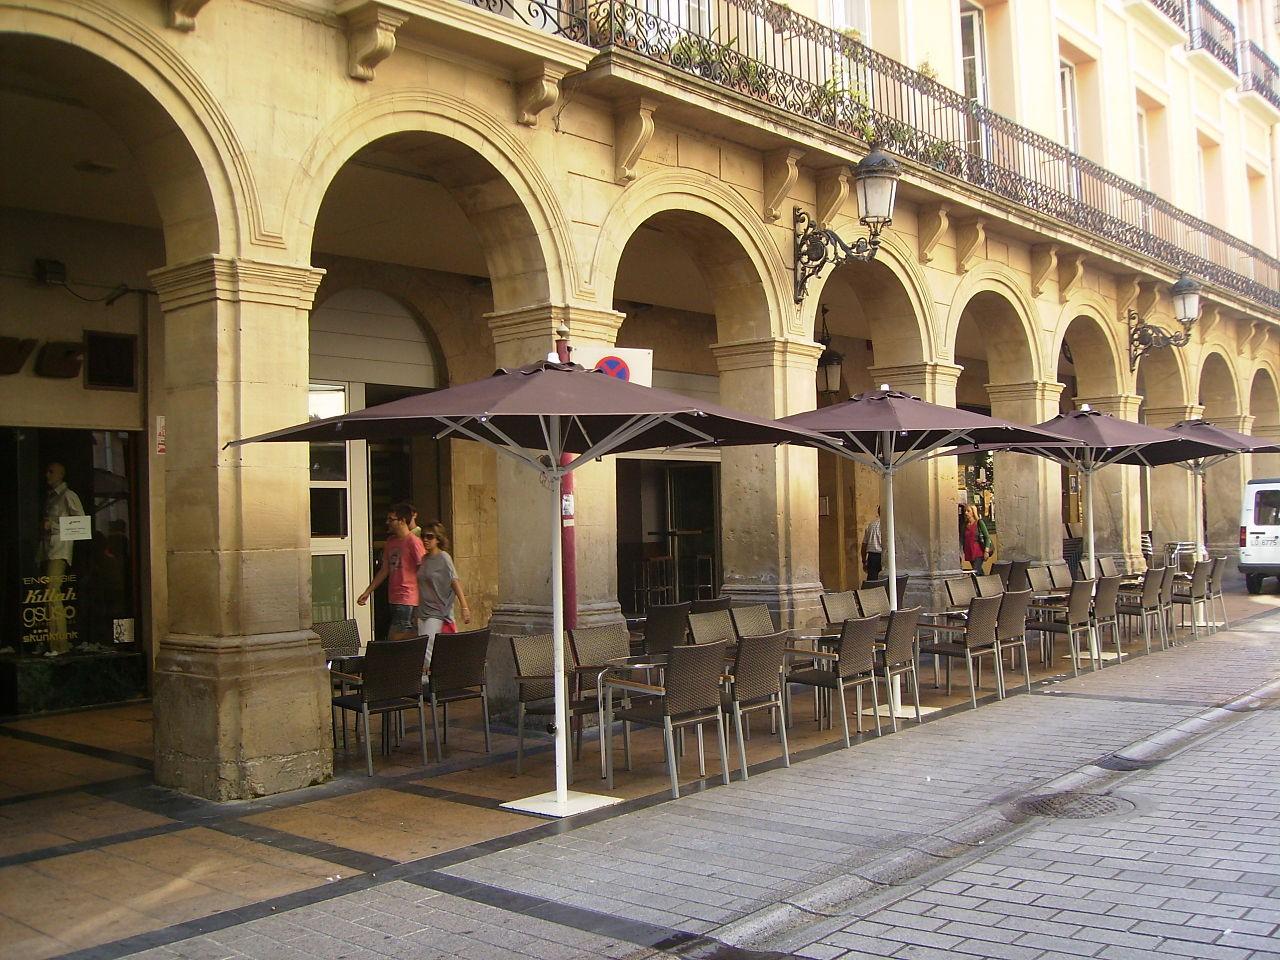 Logroño, Spain | © Hectorvm/Wikimedia Commons